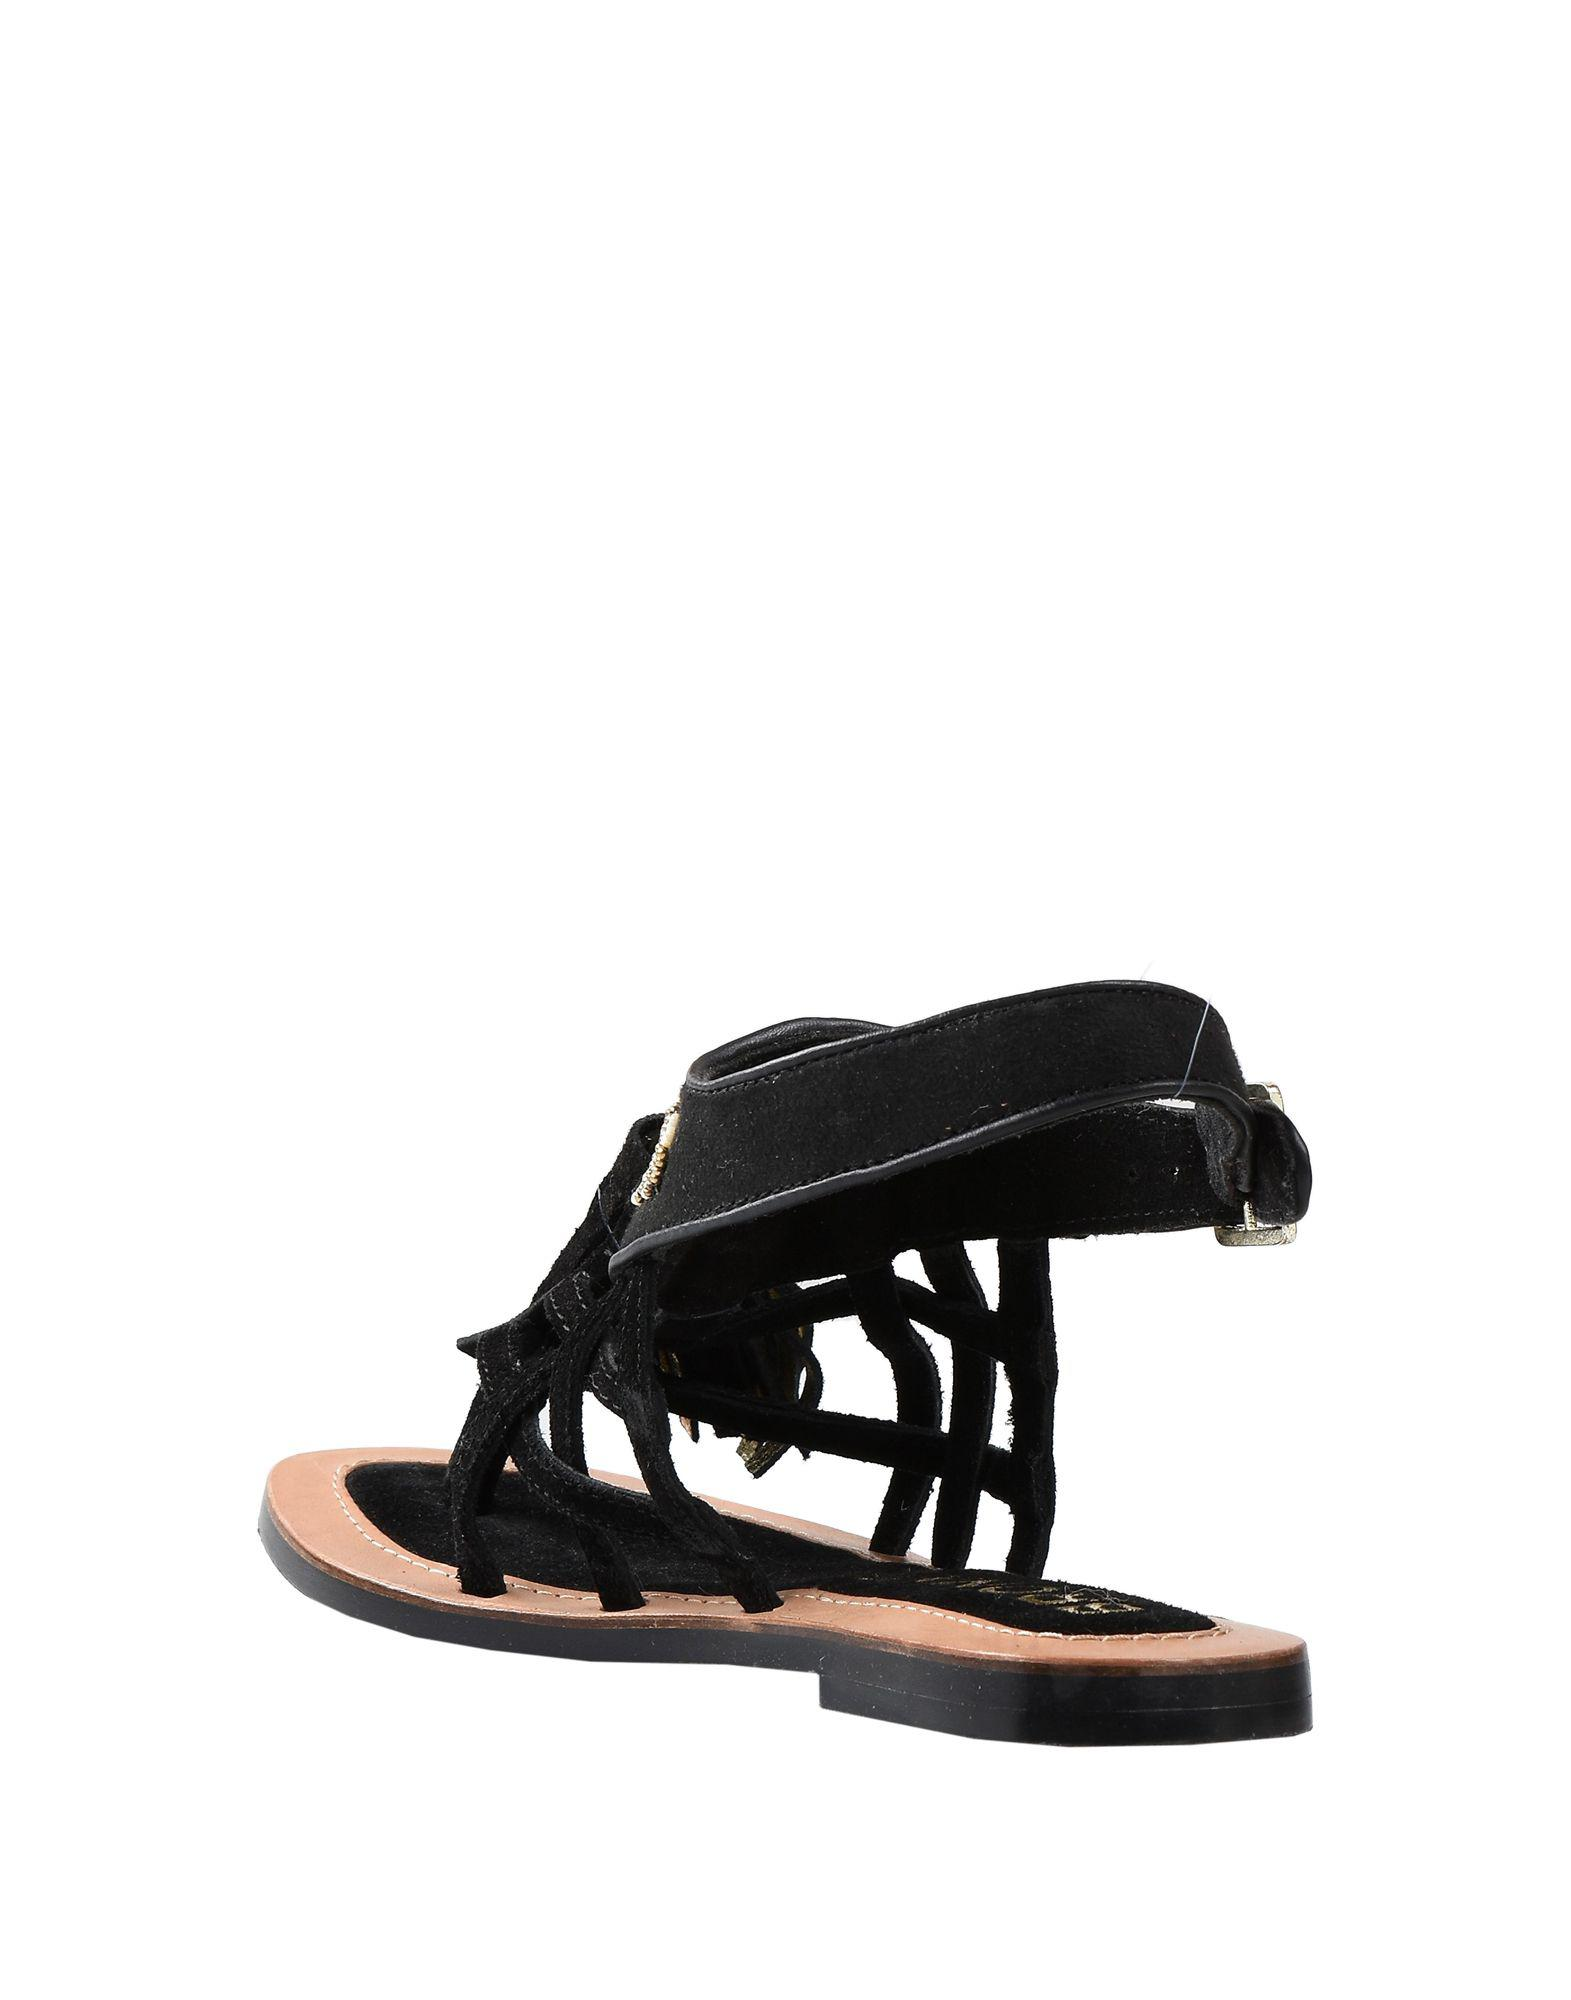 e0ea75bac68 Bronx Toe Post Sandal in Black - Lyst